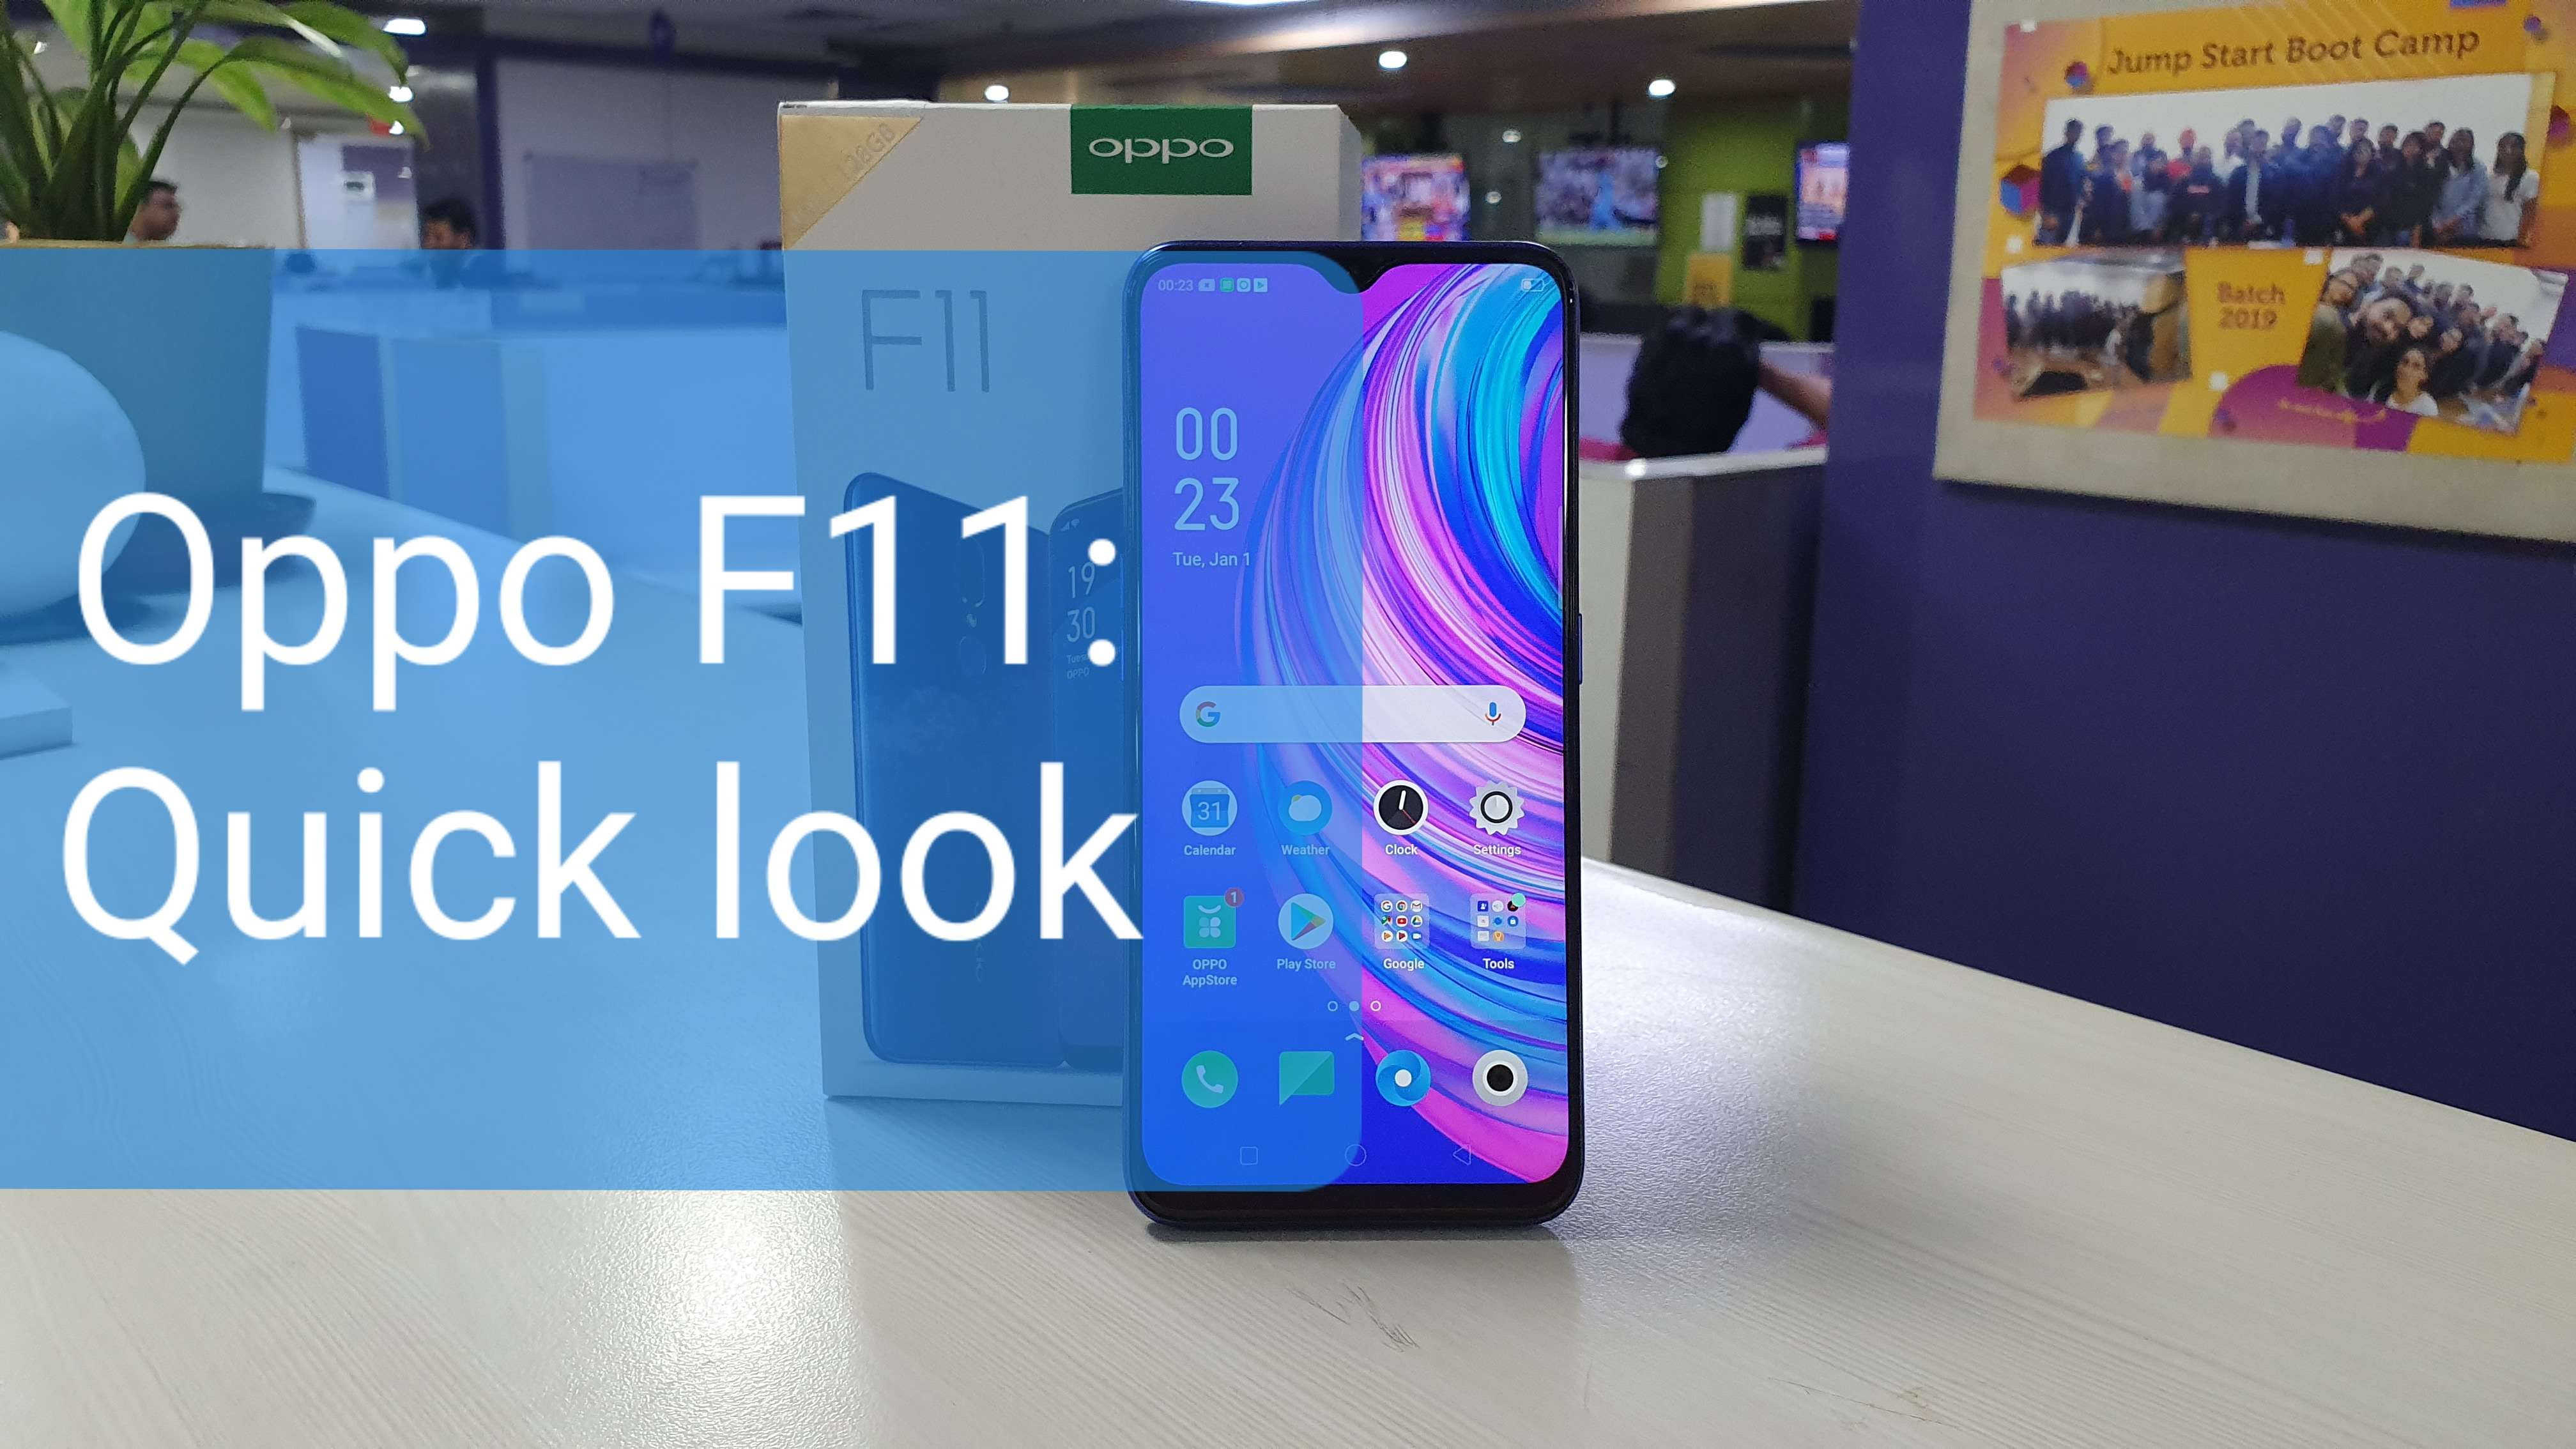 Oppo F11 quick look